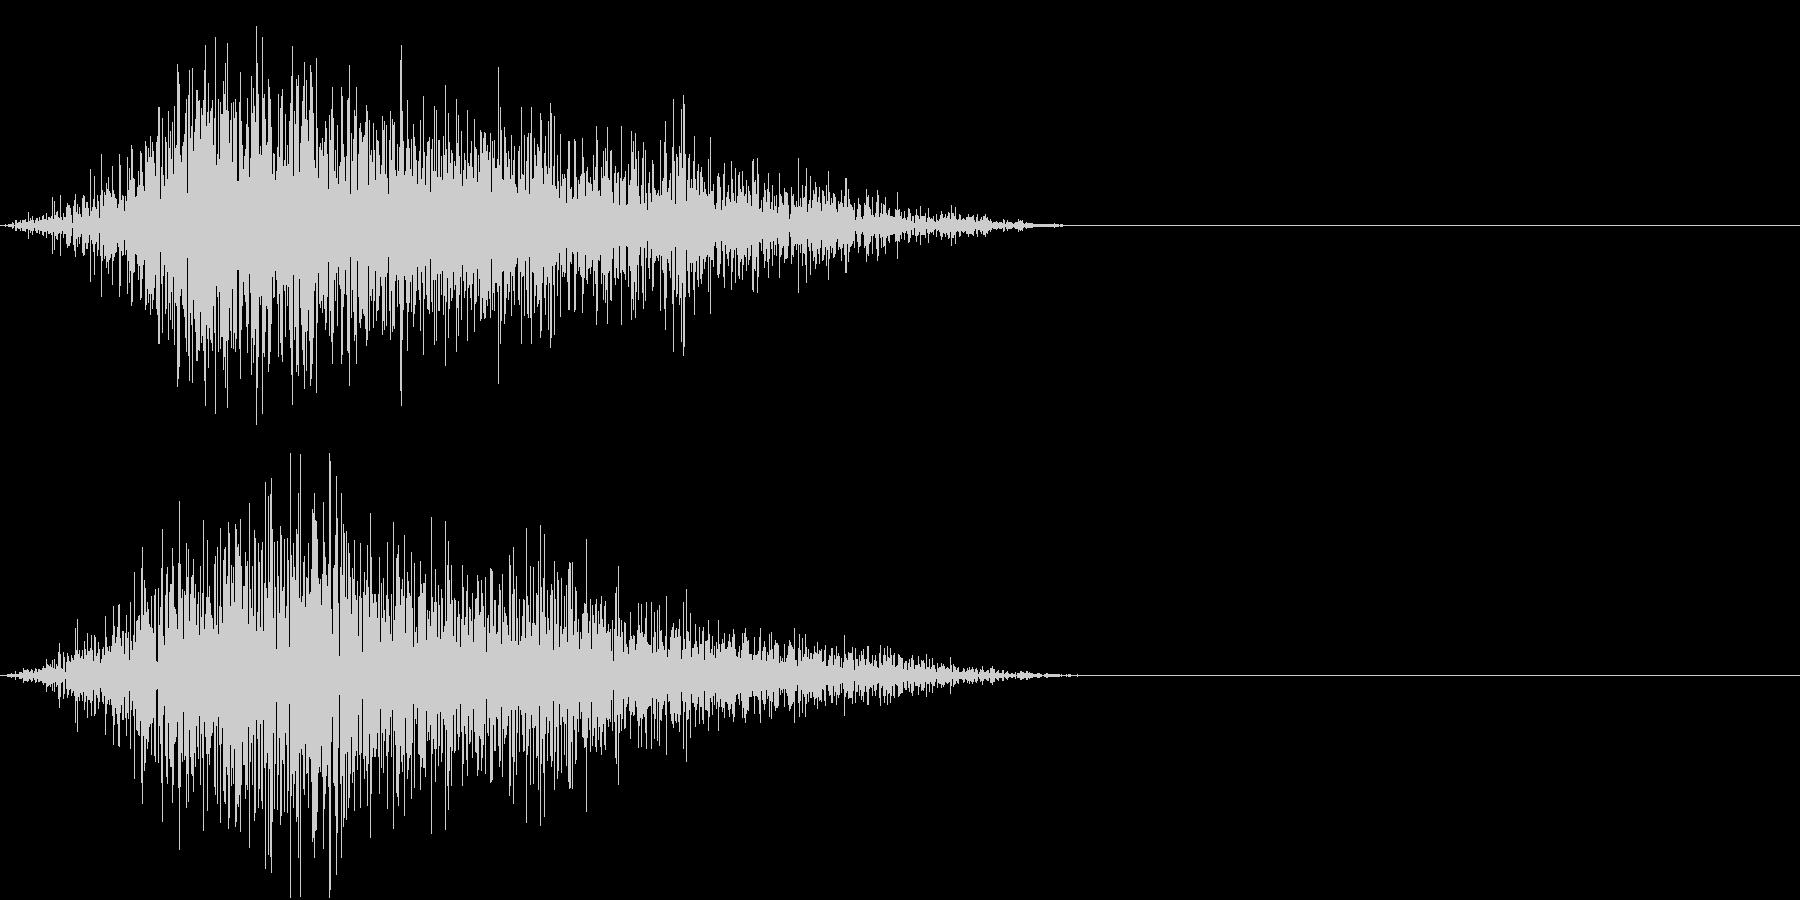 GAME ミス・エラー・キャンセル音の未再生の波形